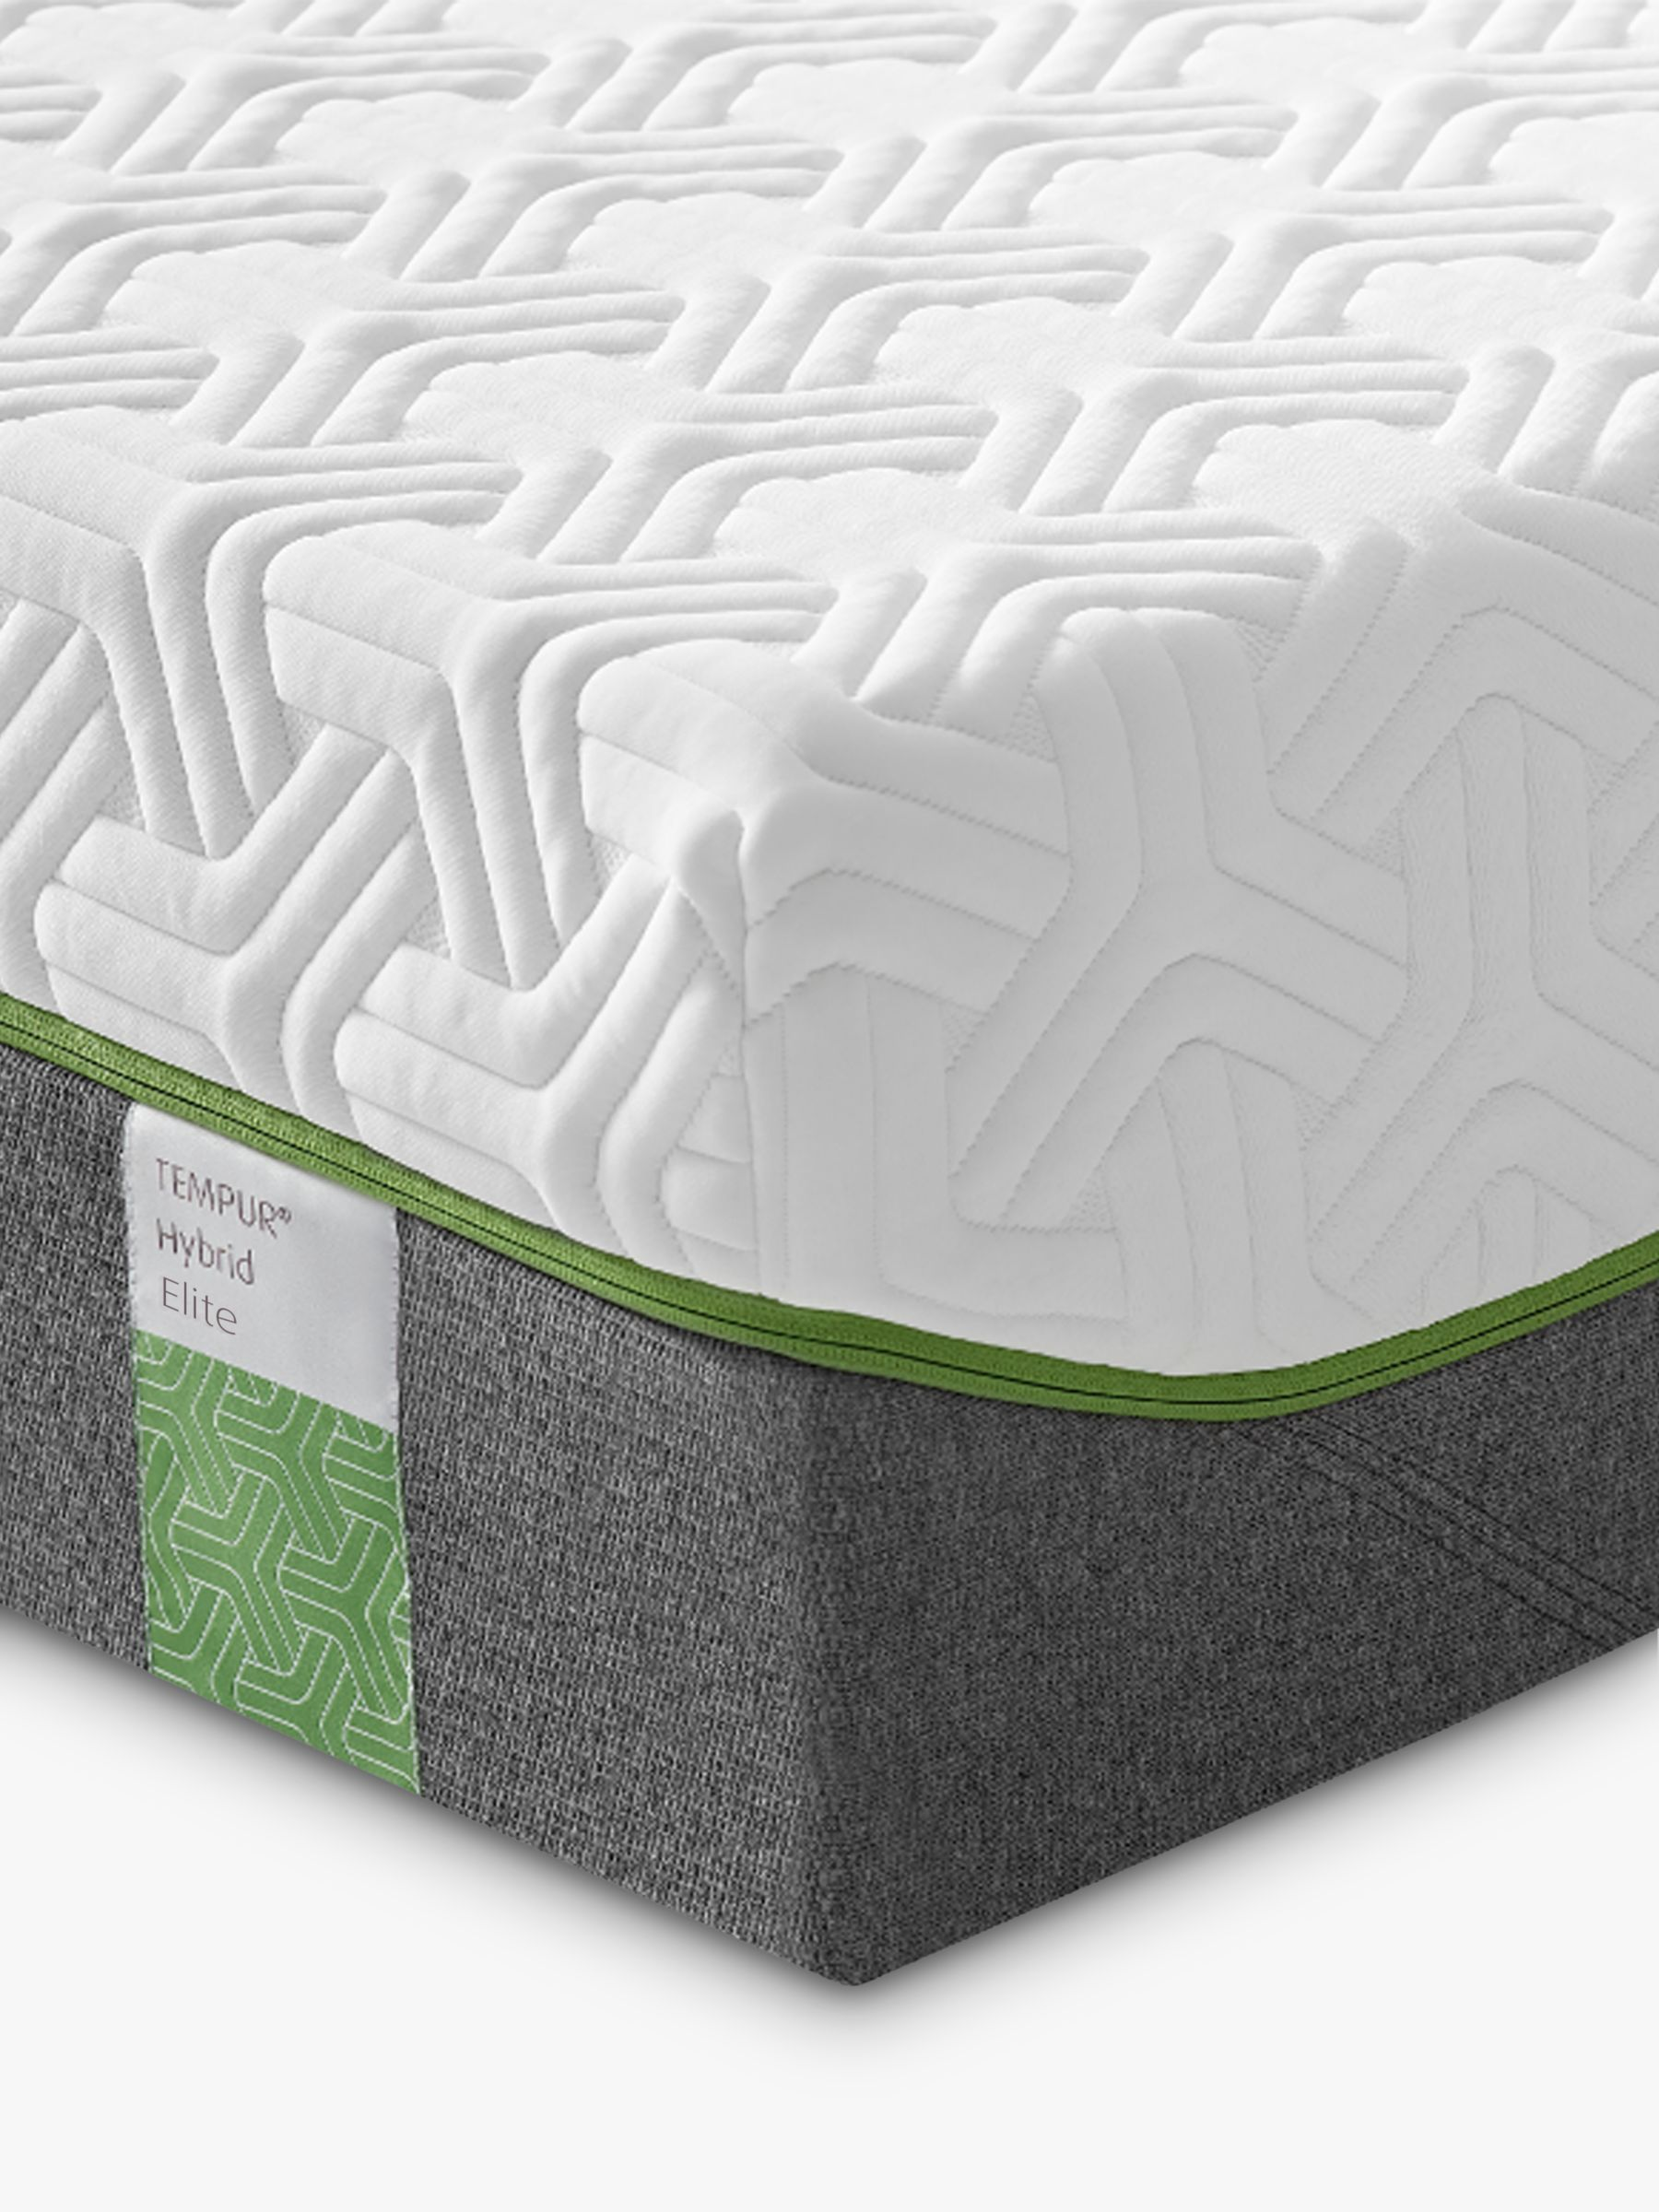 Tempur Hybrid Elite 25 Pocket Spring Memory Foam Mattress King Size In 2020 Memory Foam Mattress Foam Mattress Memory Foam Mattress Cover